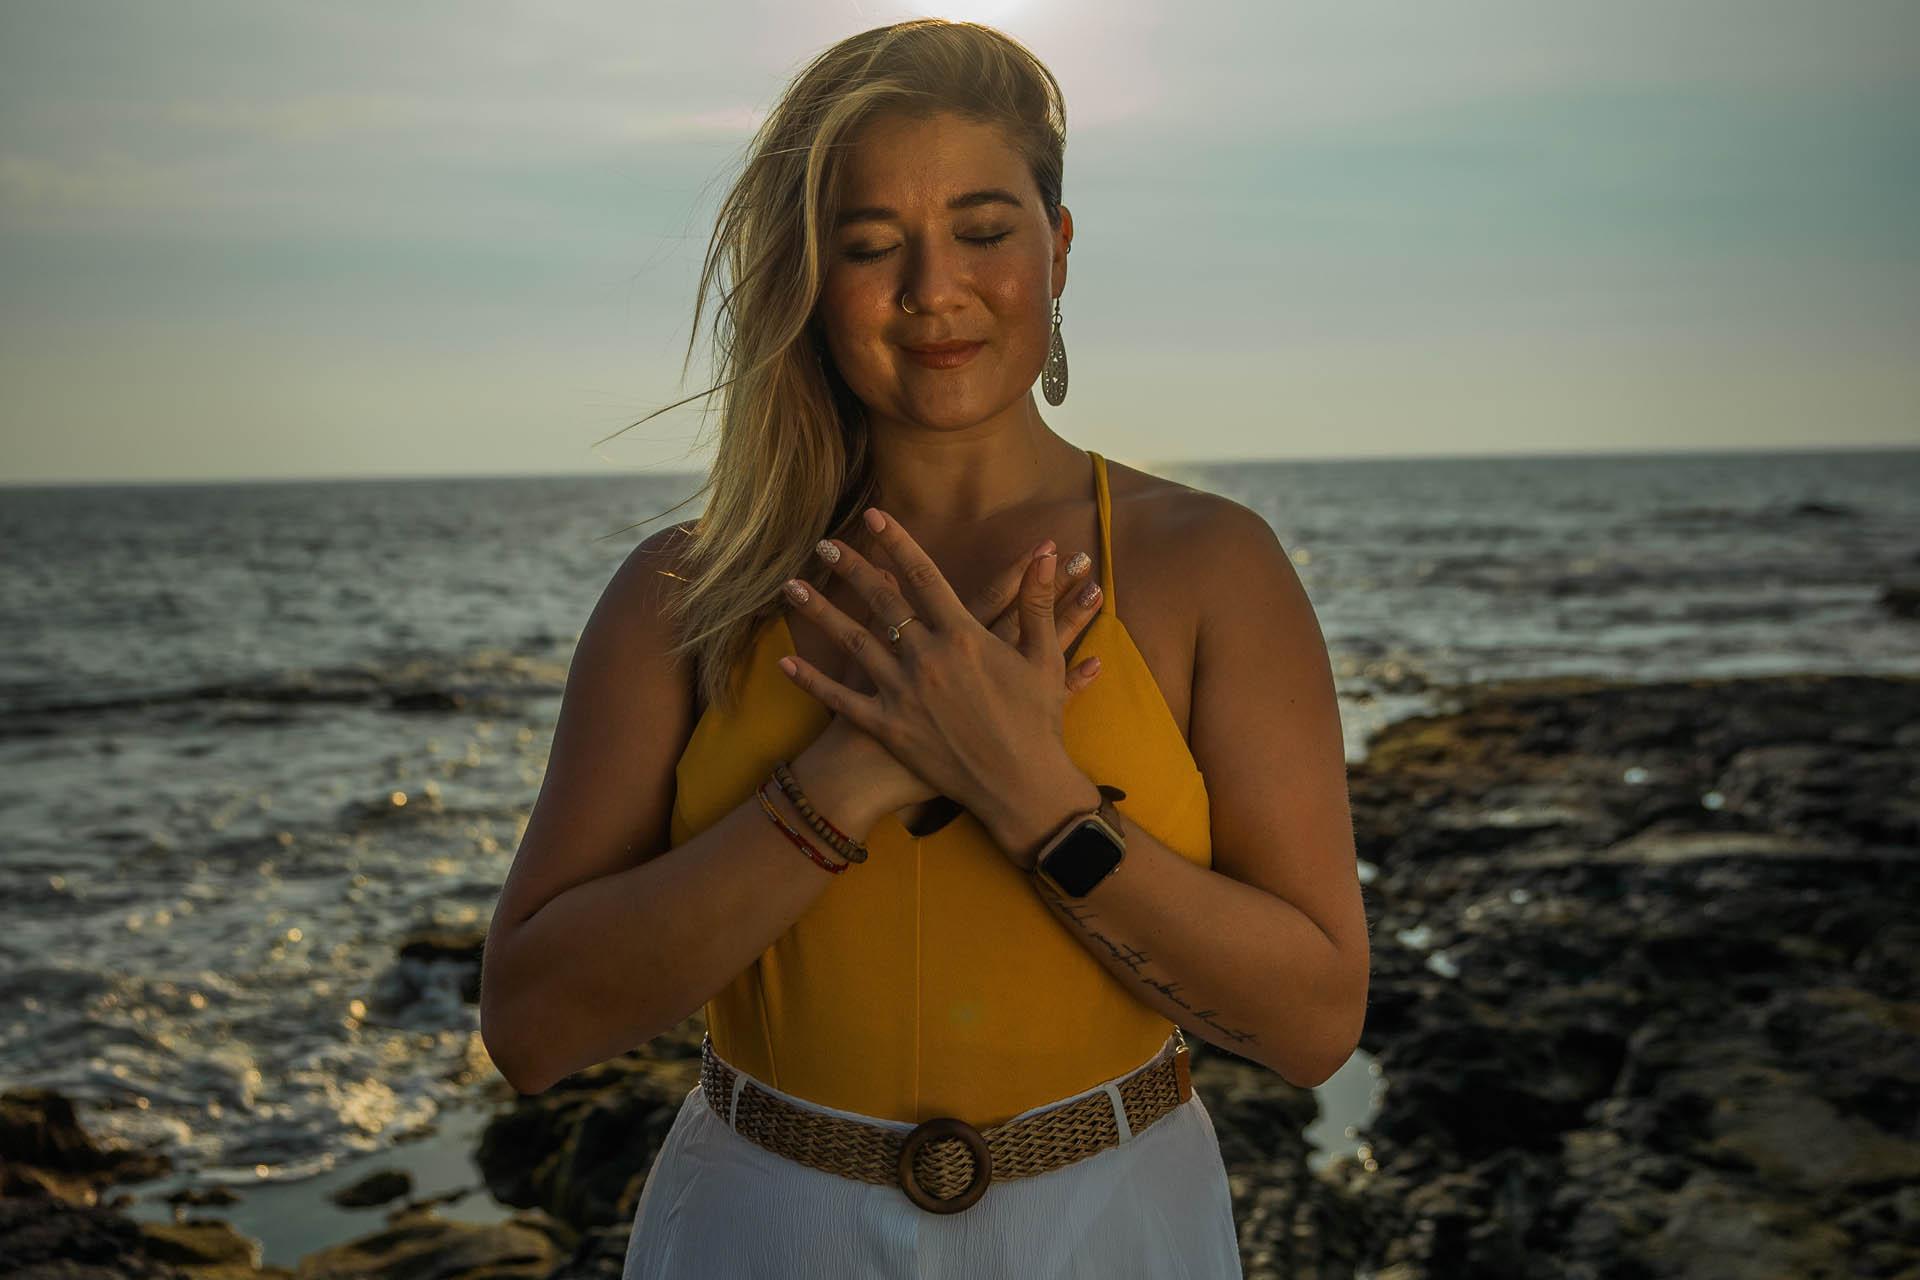 Woman standing in front of ocean with hands over heart.